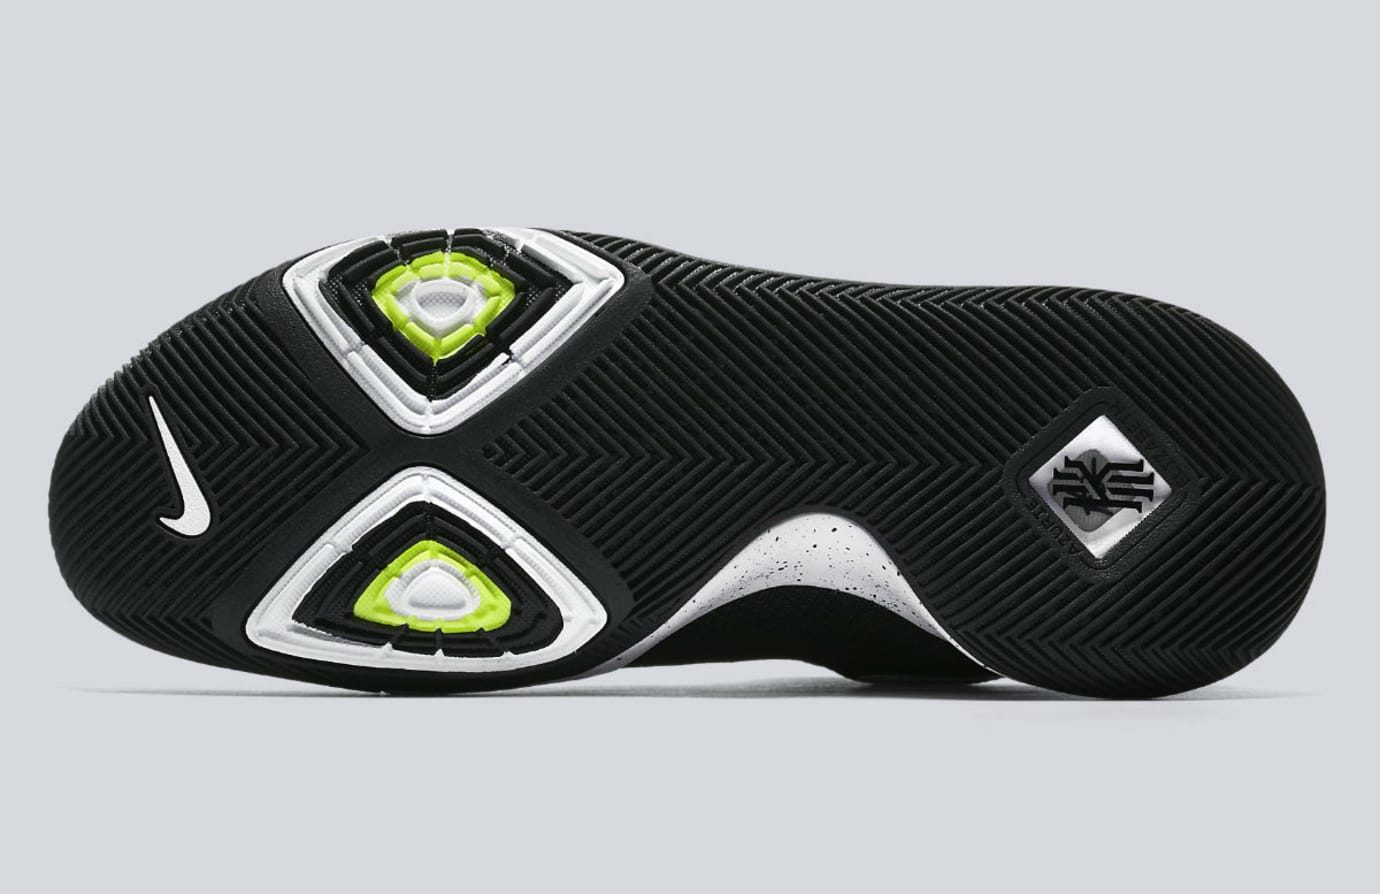 Nike Kyrie 3 Black White Tuxedo Release Date Sole 917724-001